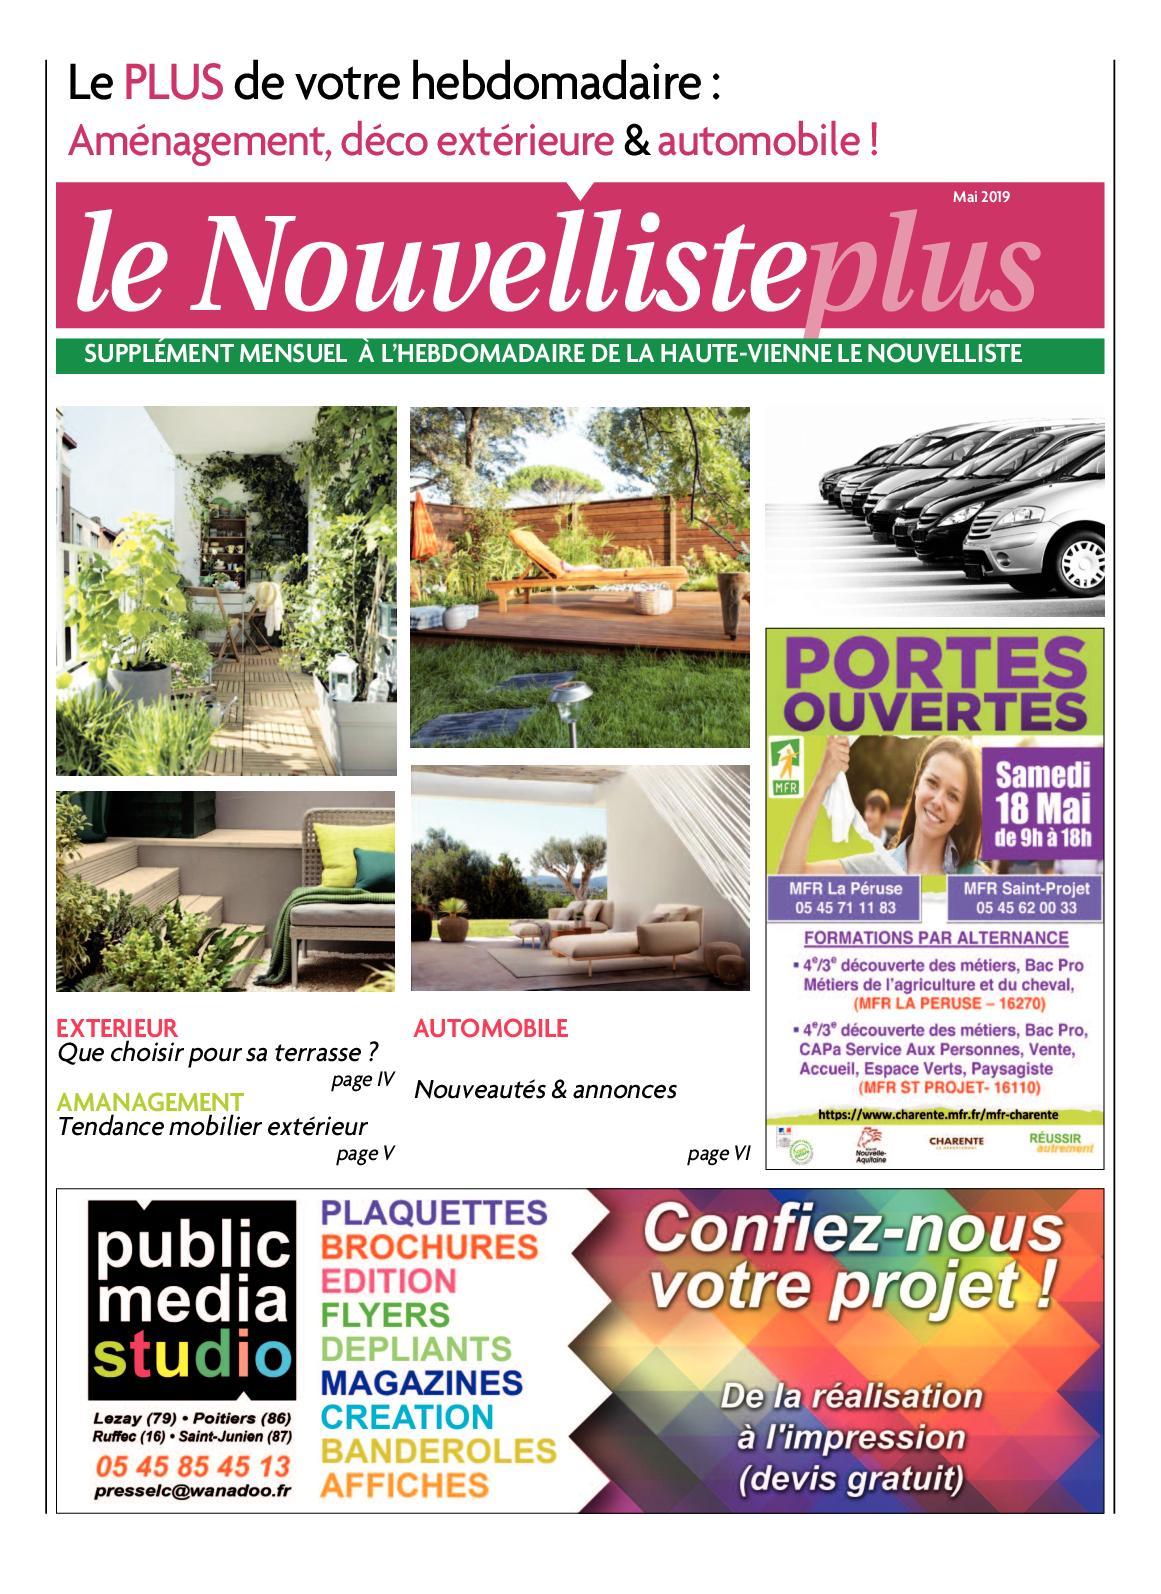 Calaméo - LE NOUVELLISTE PLUS - MAI 2019